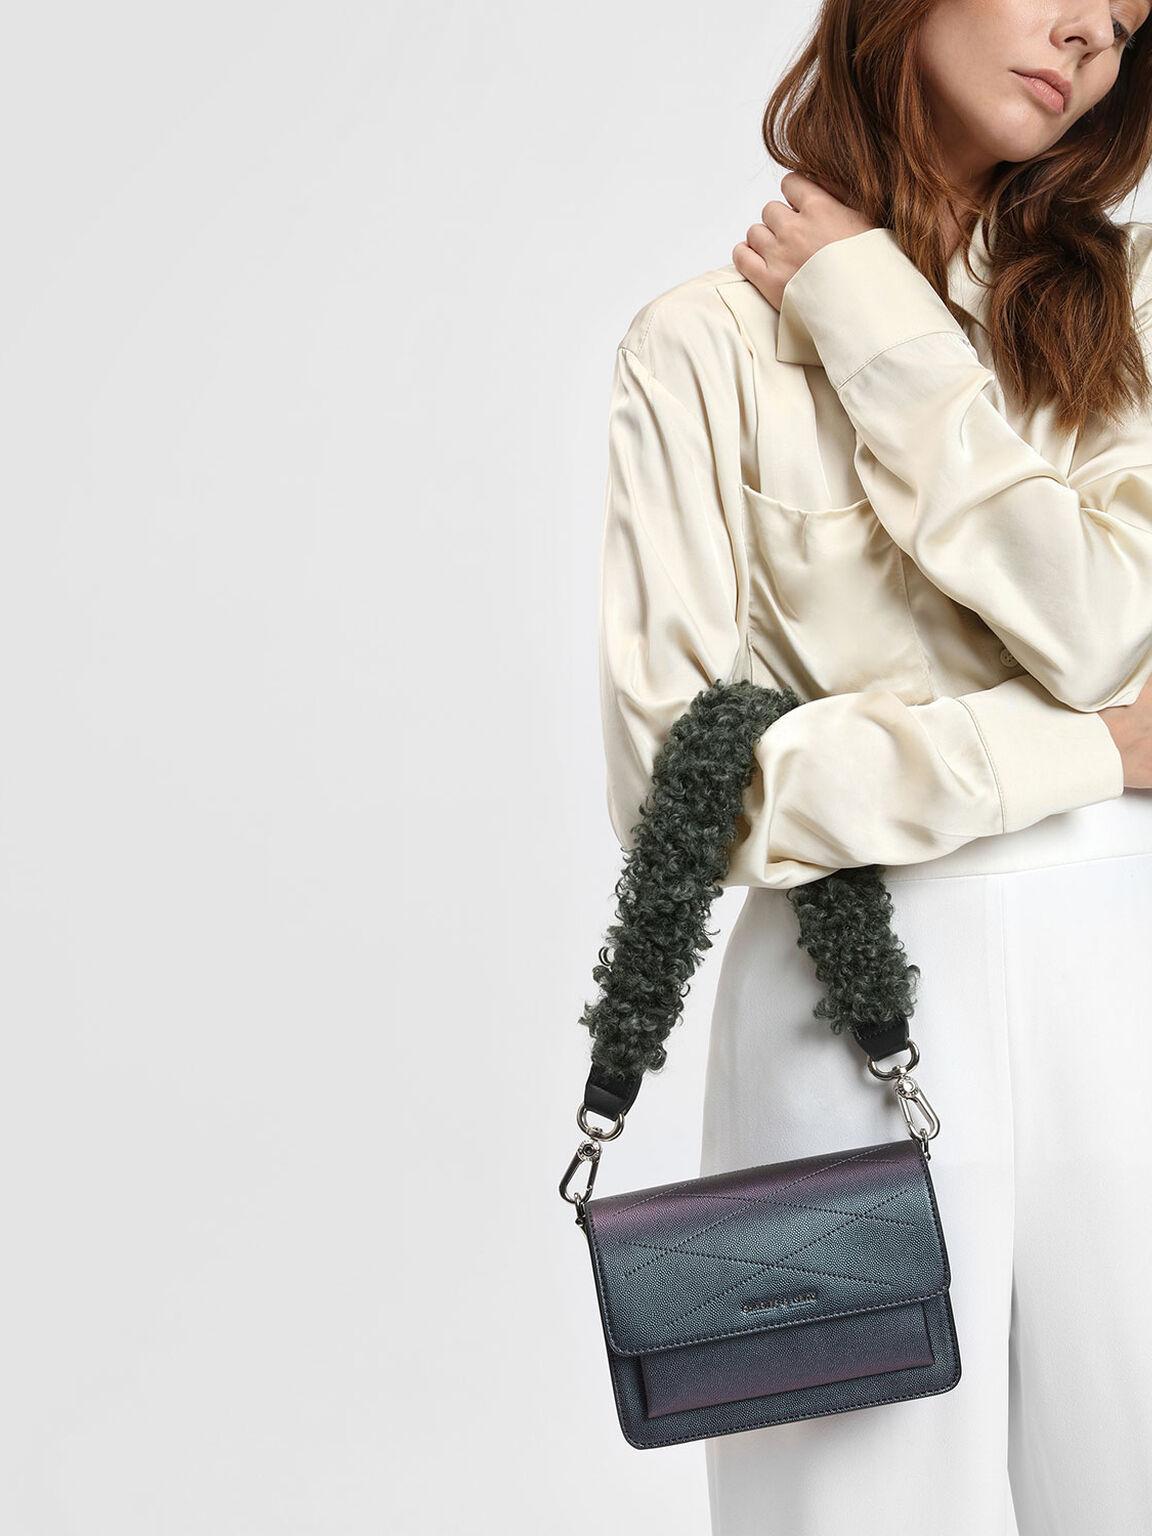 Furry Bag Strap, Dark Green, hi-res